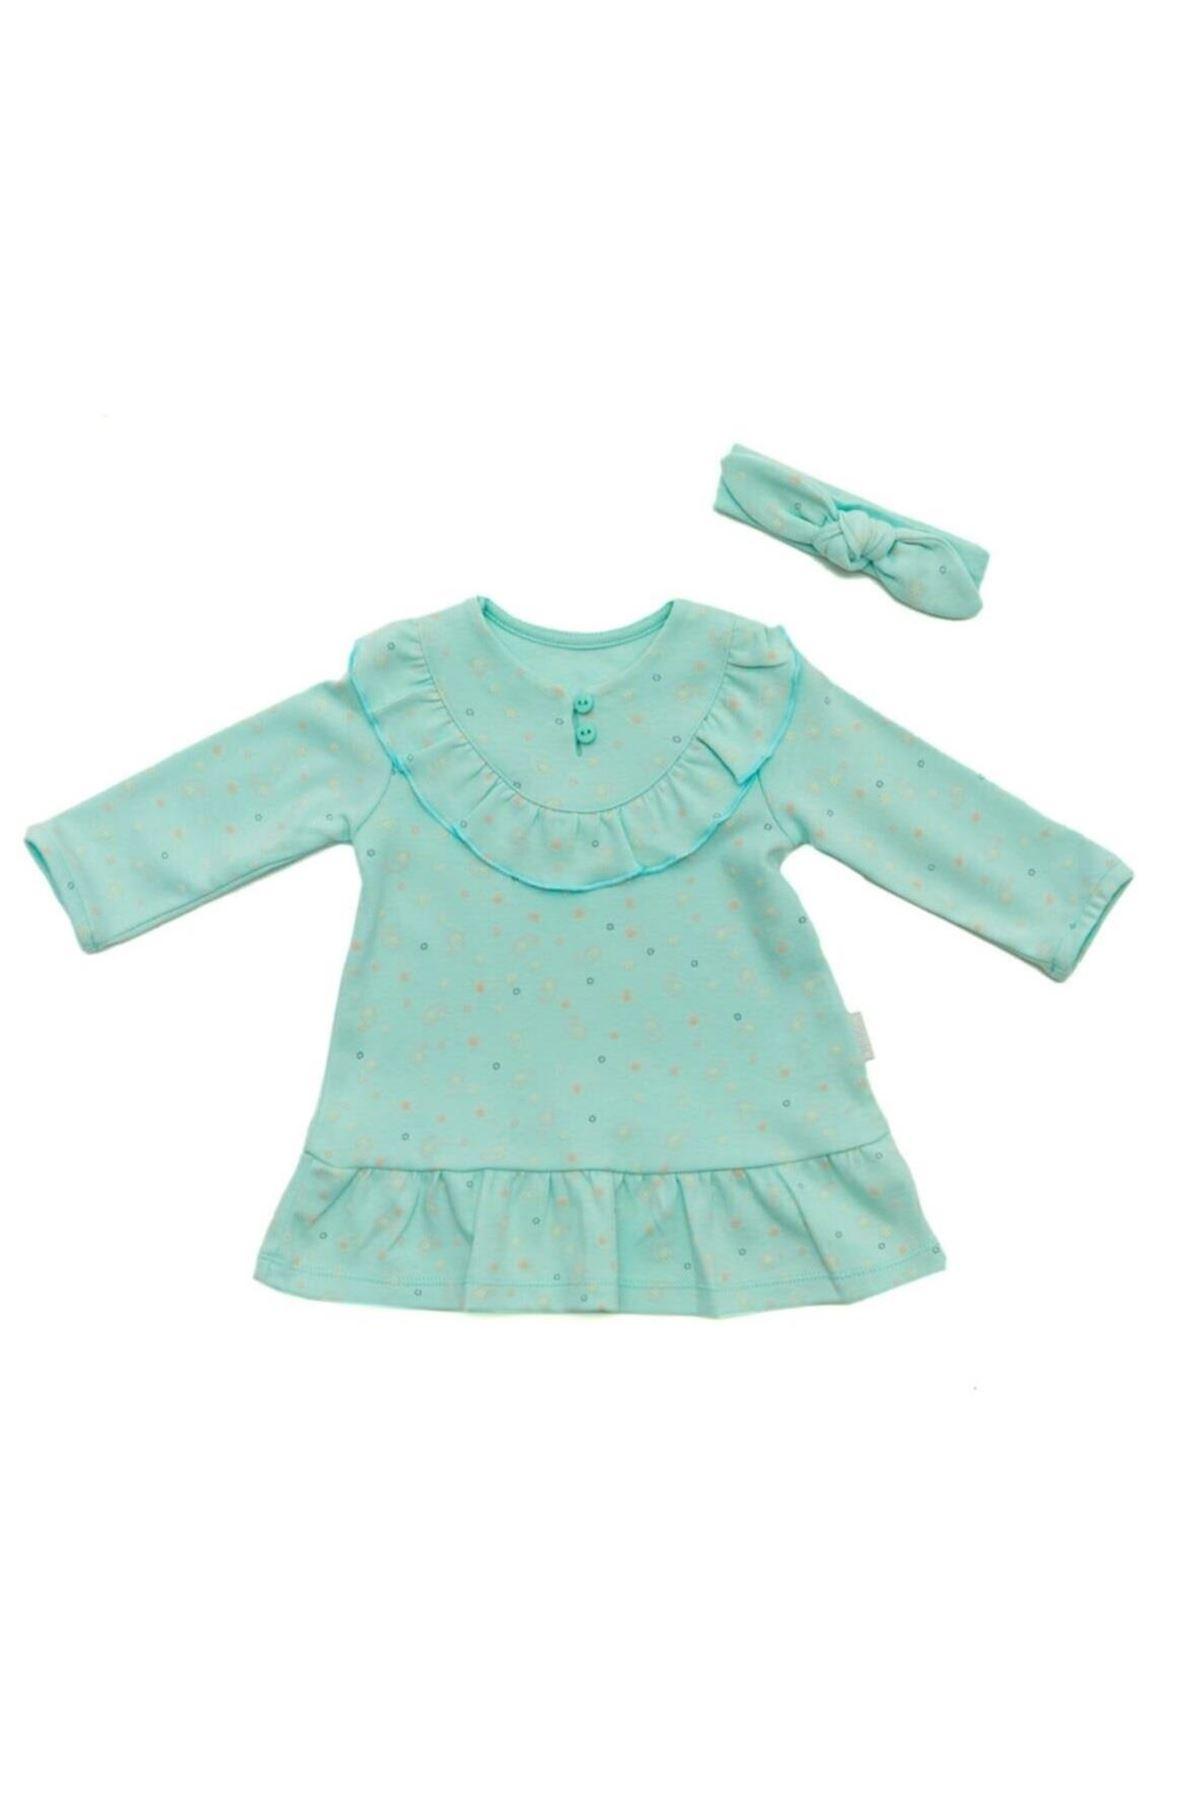 Andywawa AC22125 Home Sweet Home Kız Elbise Mint